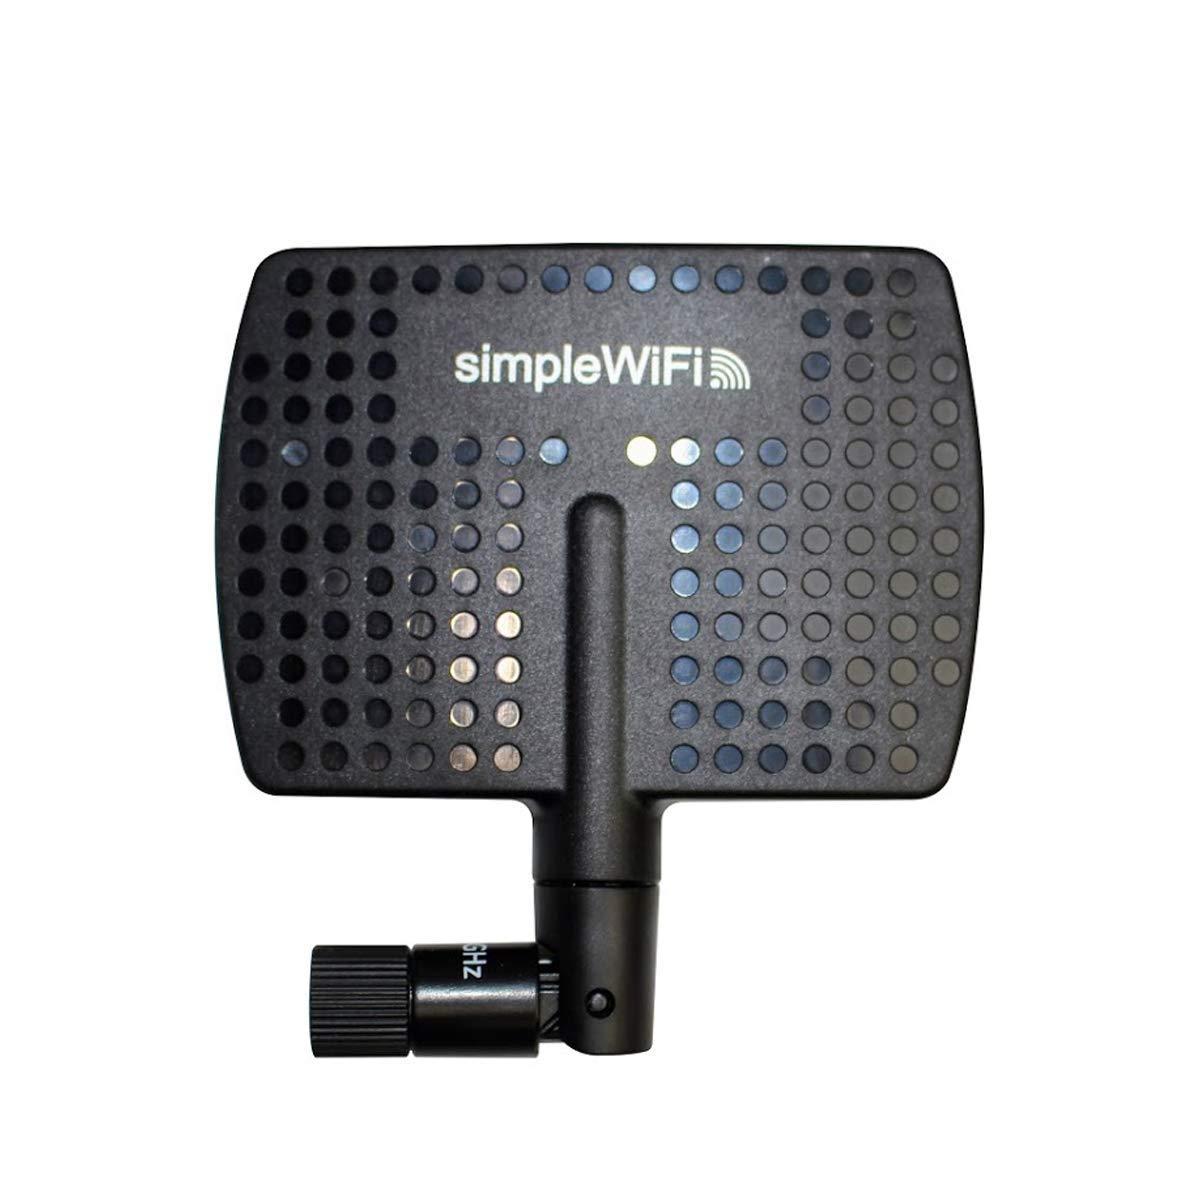 Cheap Usb Wifi Antenna Hack, find Usb Wifi Antenna Hack